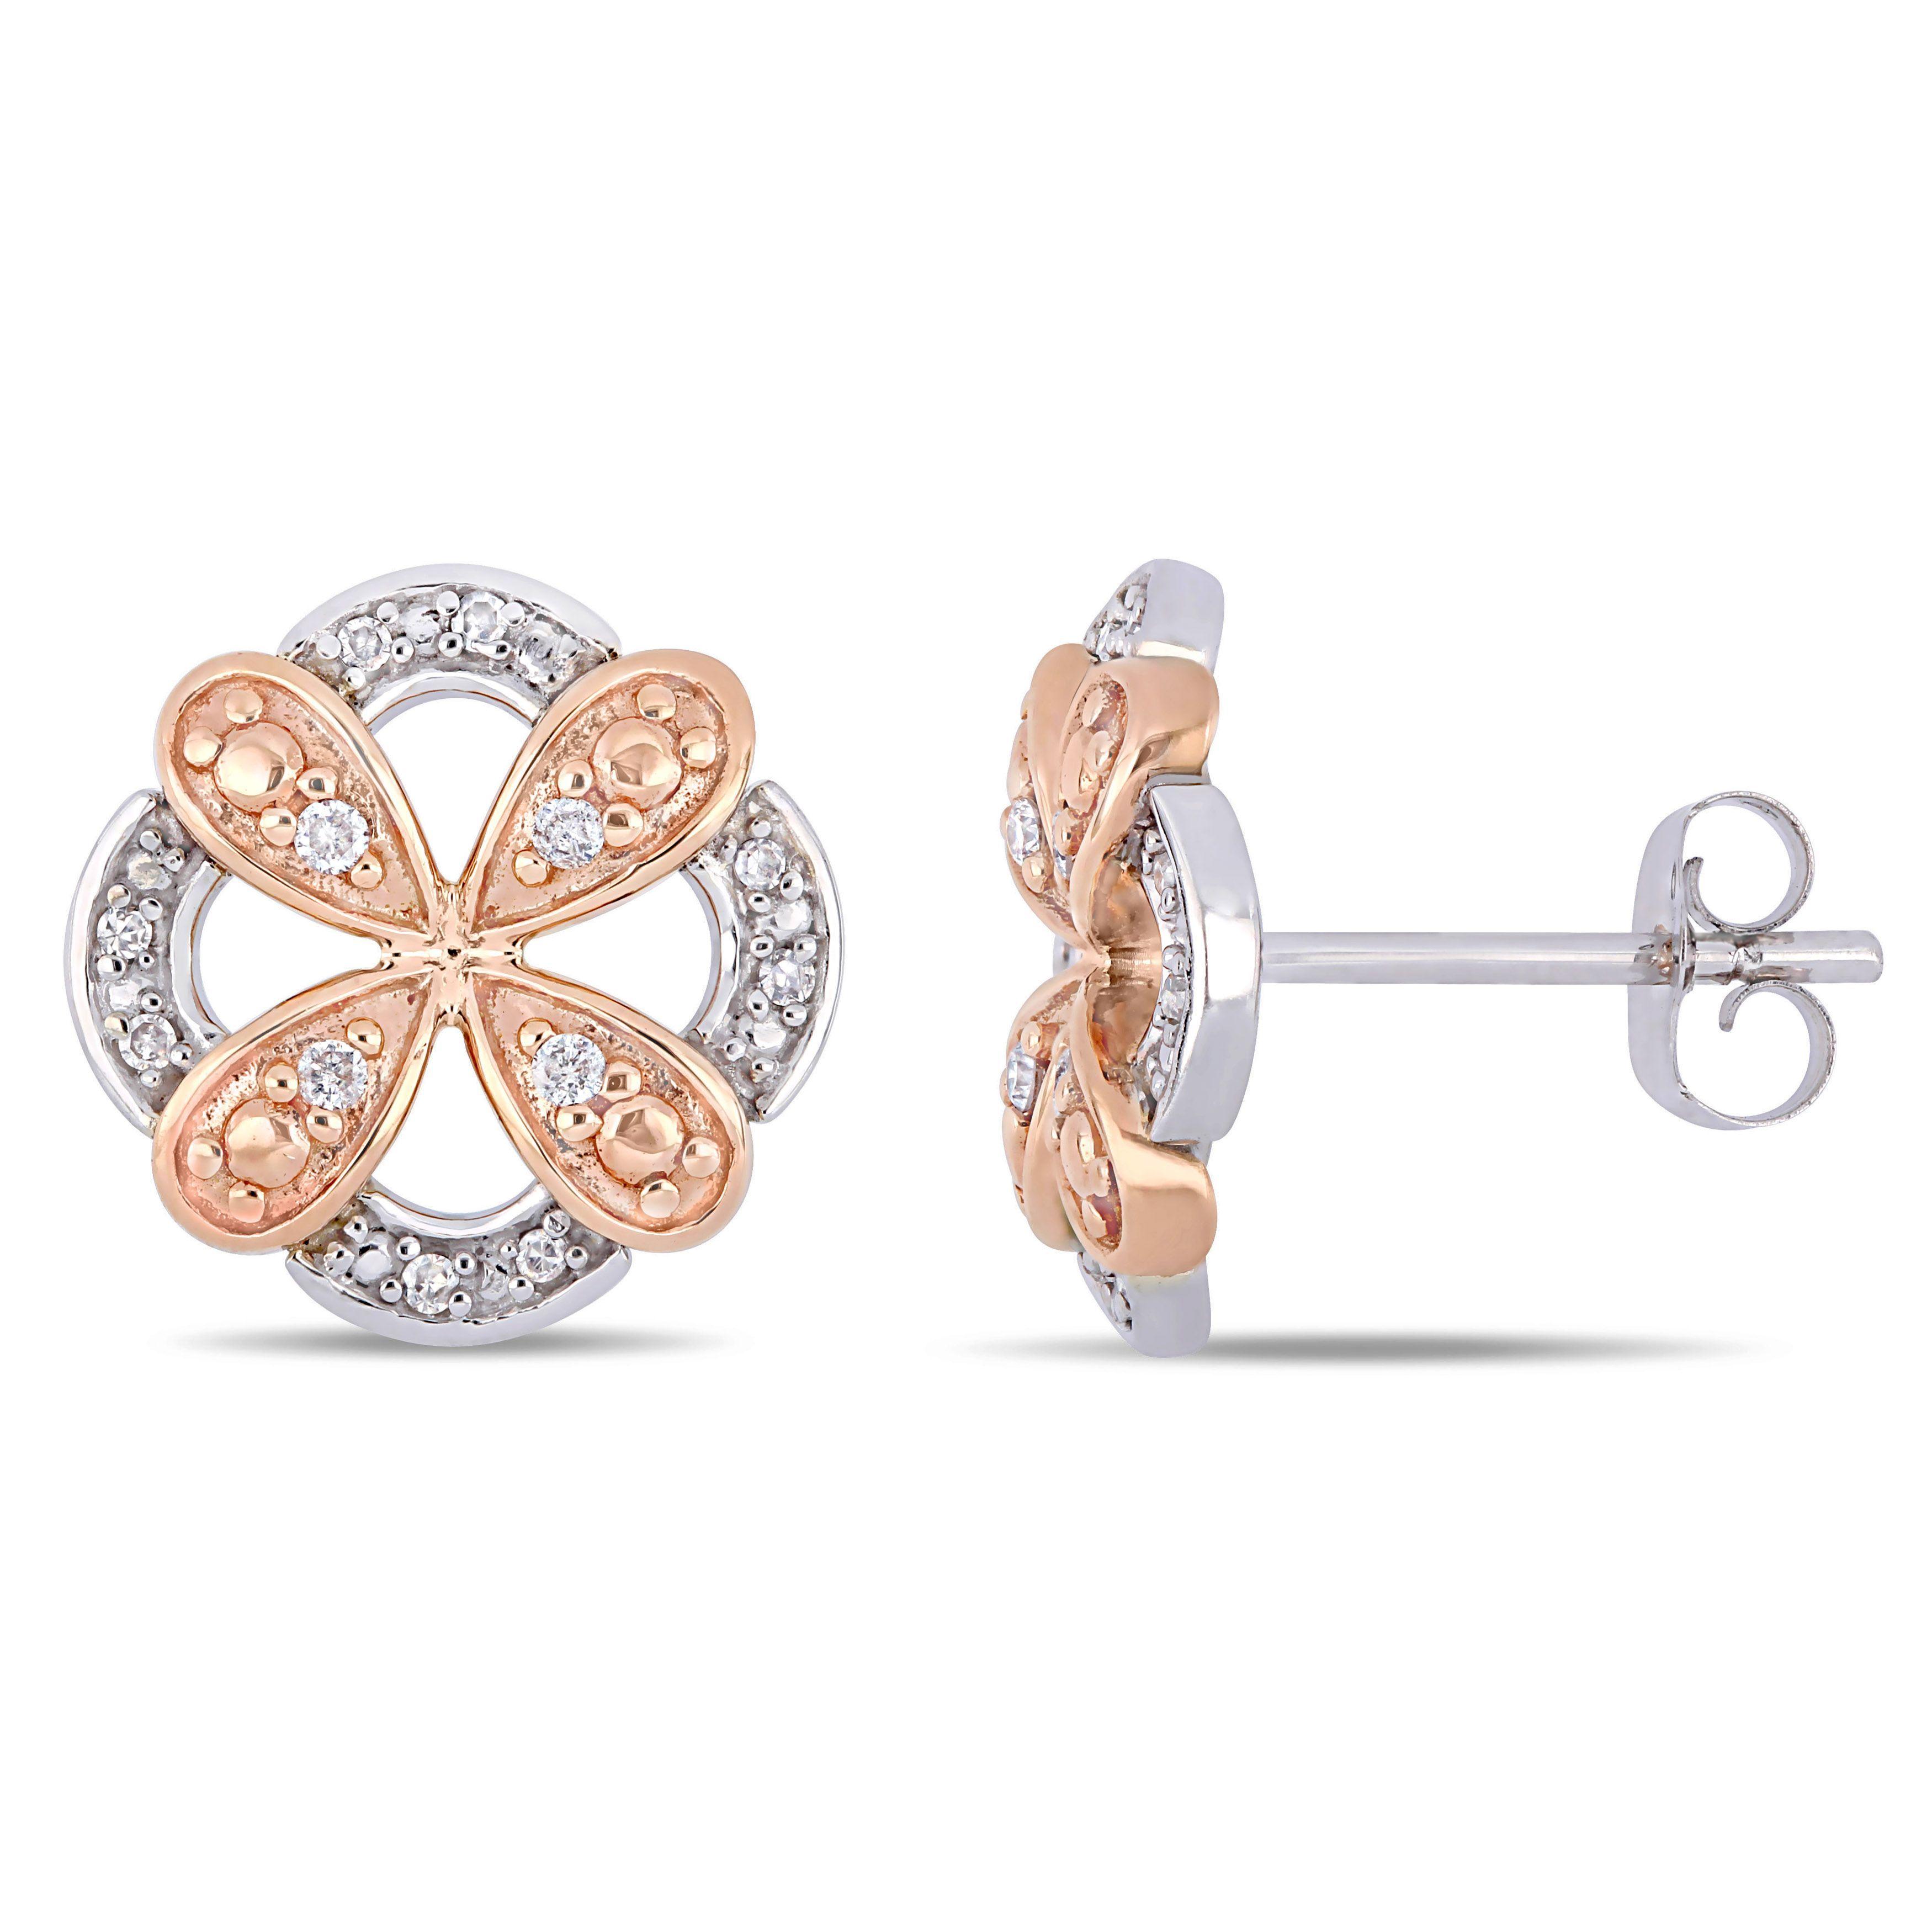 Everly Diamond Flower Petal Fashion Stud Earrings In 10k White Rose Gold Jewelry Inspiration Latest Jewellery Trends Stud Earrings